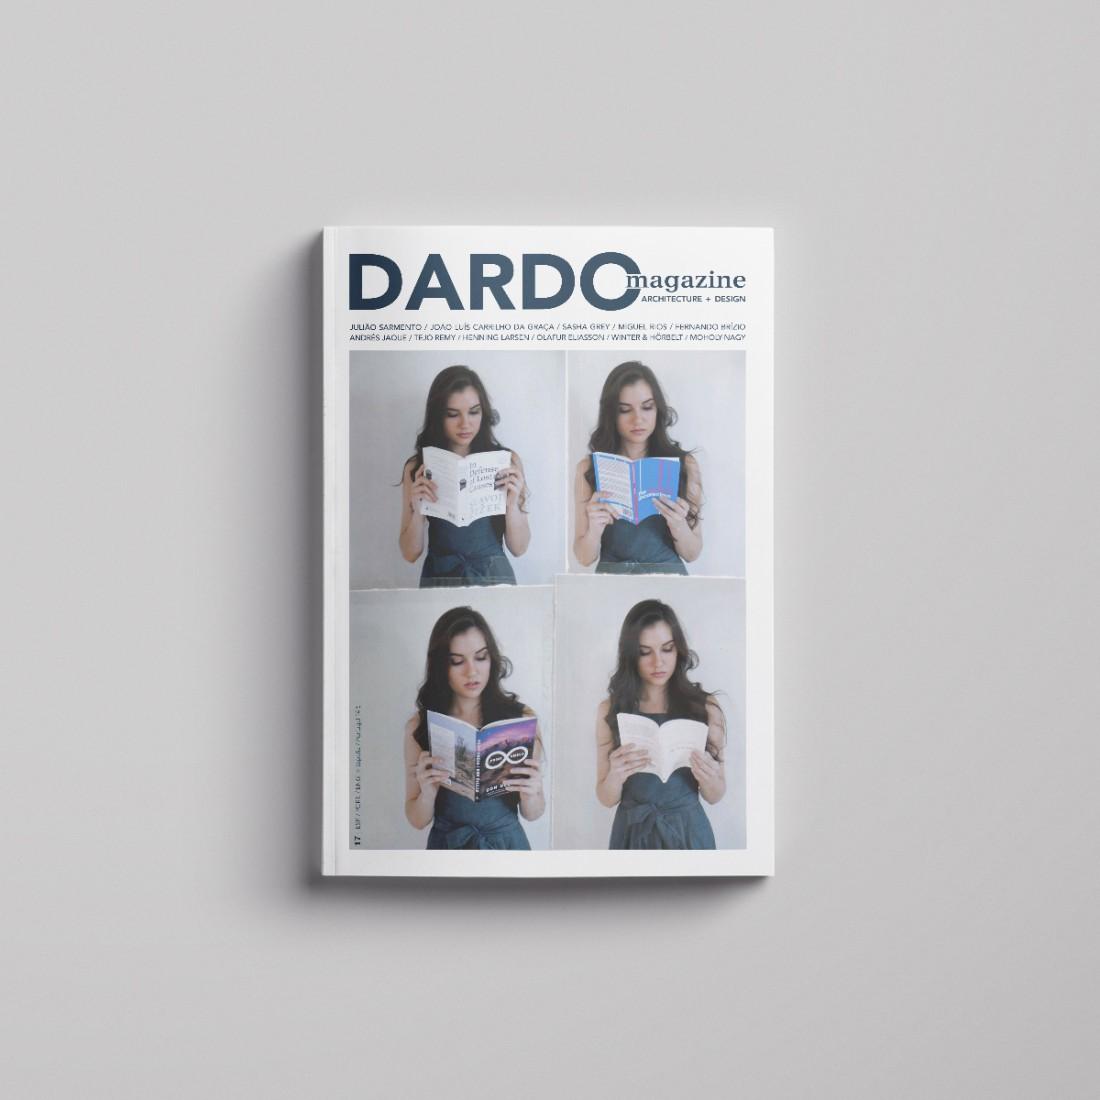 DARDOmagazine 17